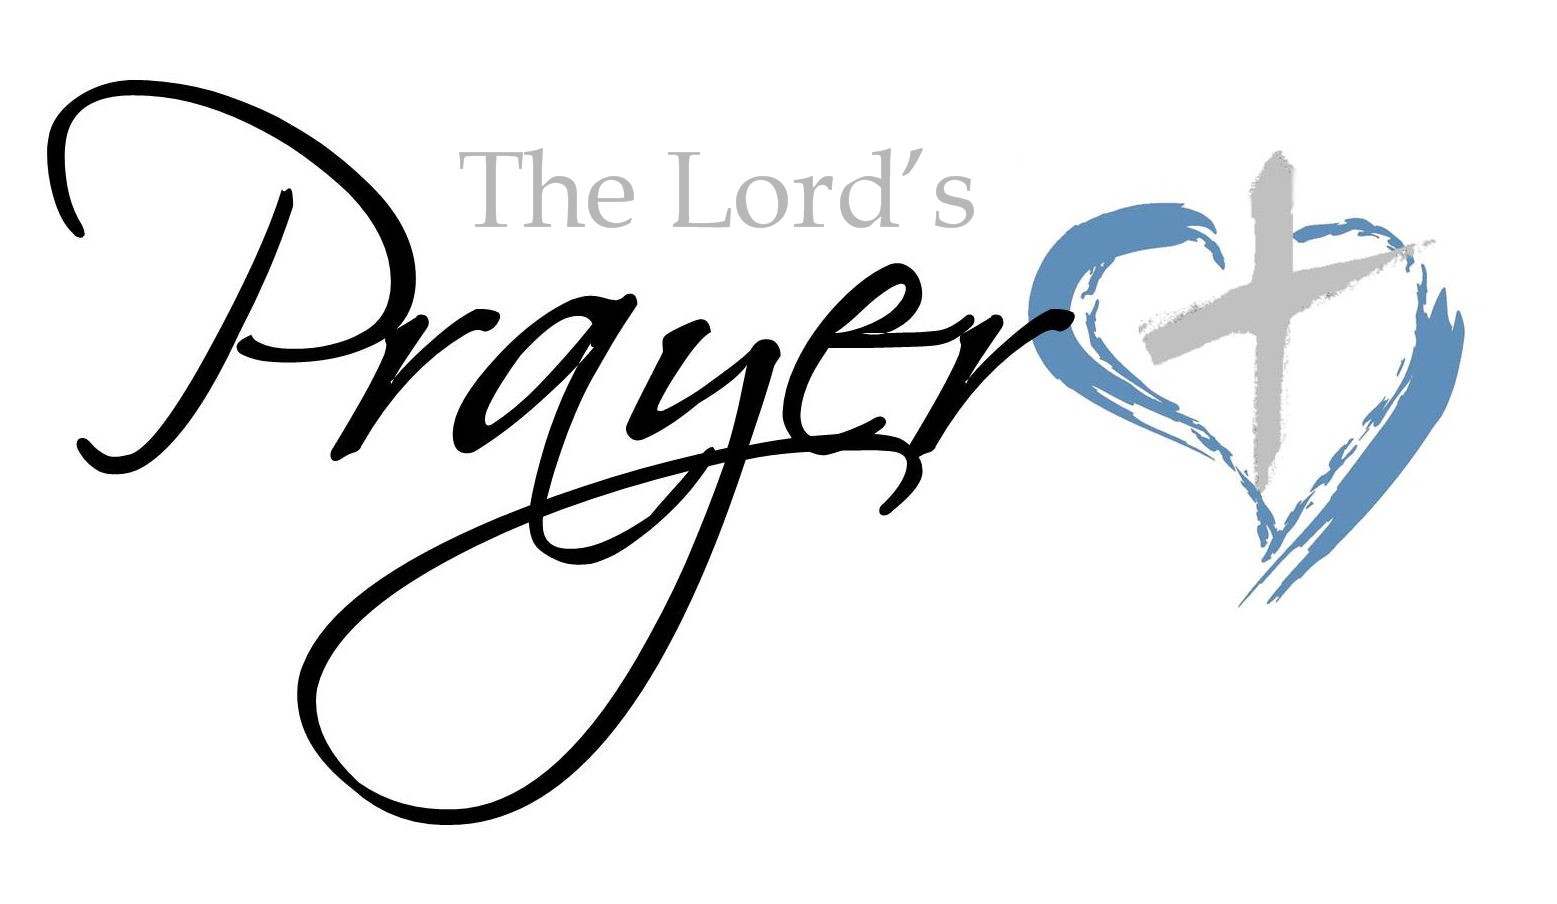 1557x904 Praying Hands Praying Hand Child Prayer Hands Clip Art Image 6 8